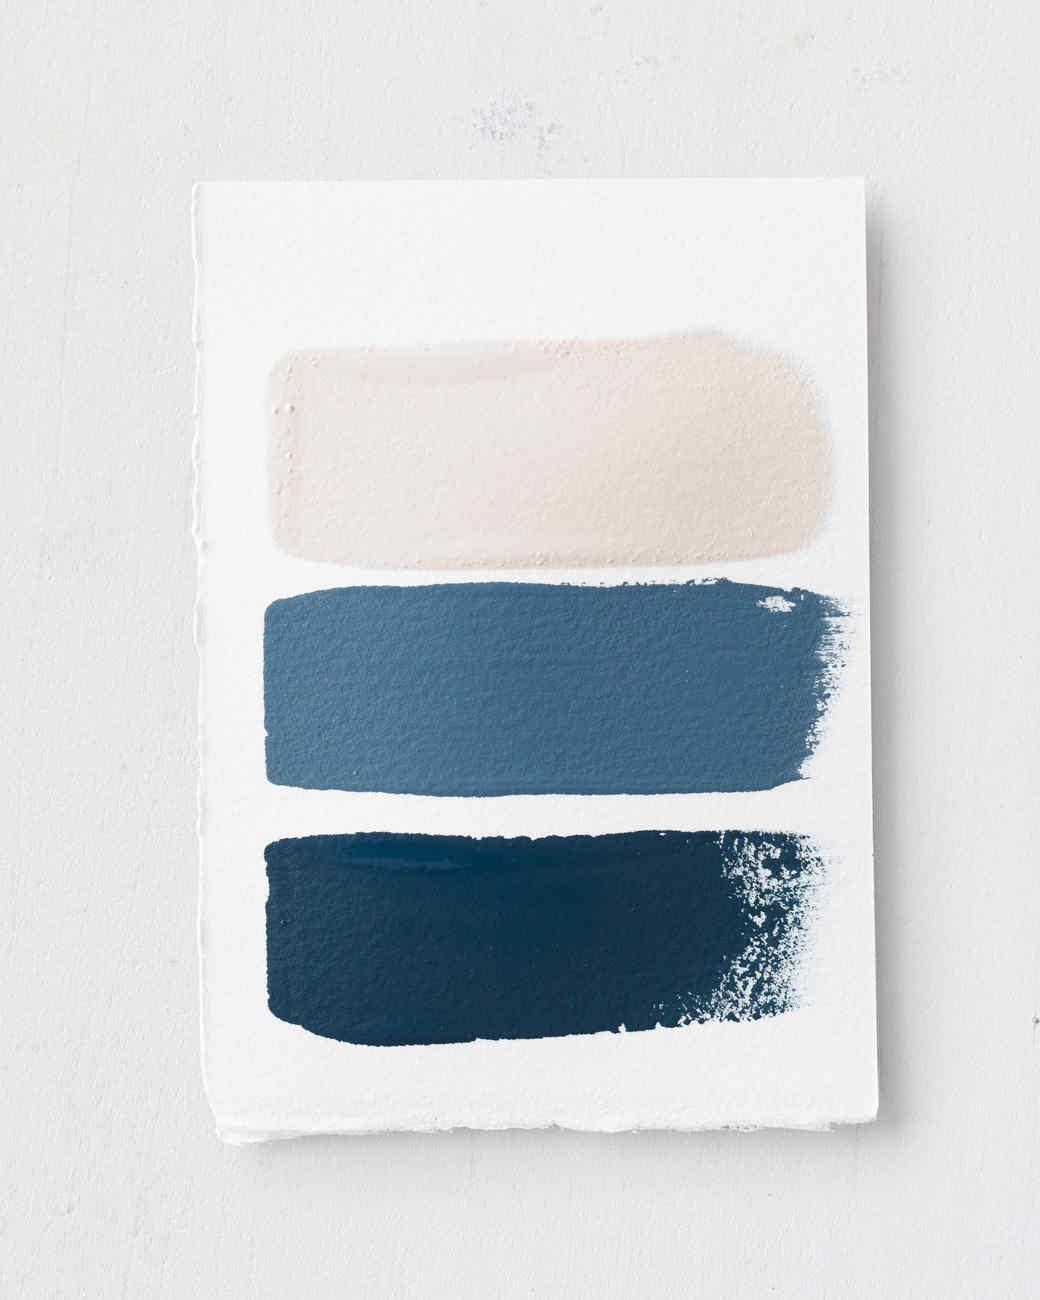 paint-swatch-david-rau-mld110837-4.jpg